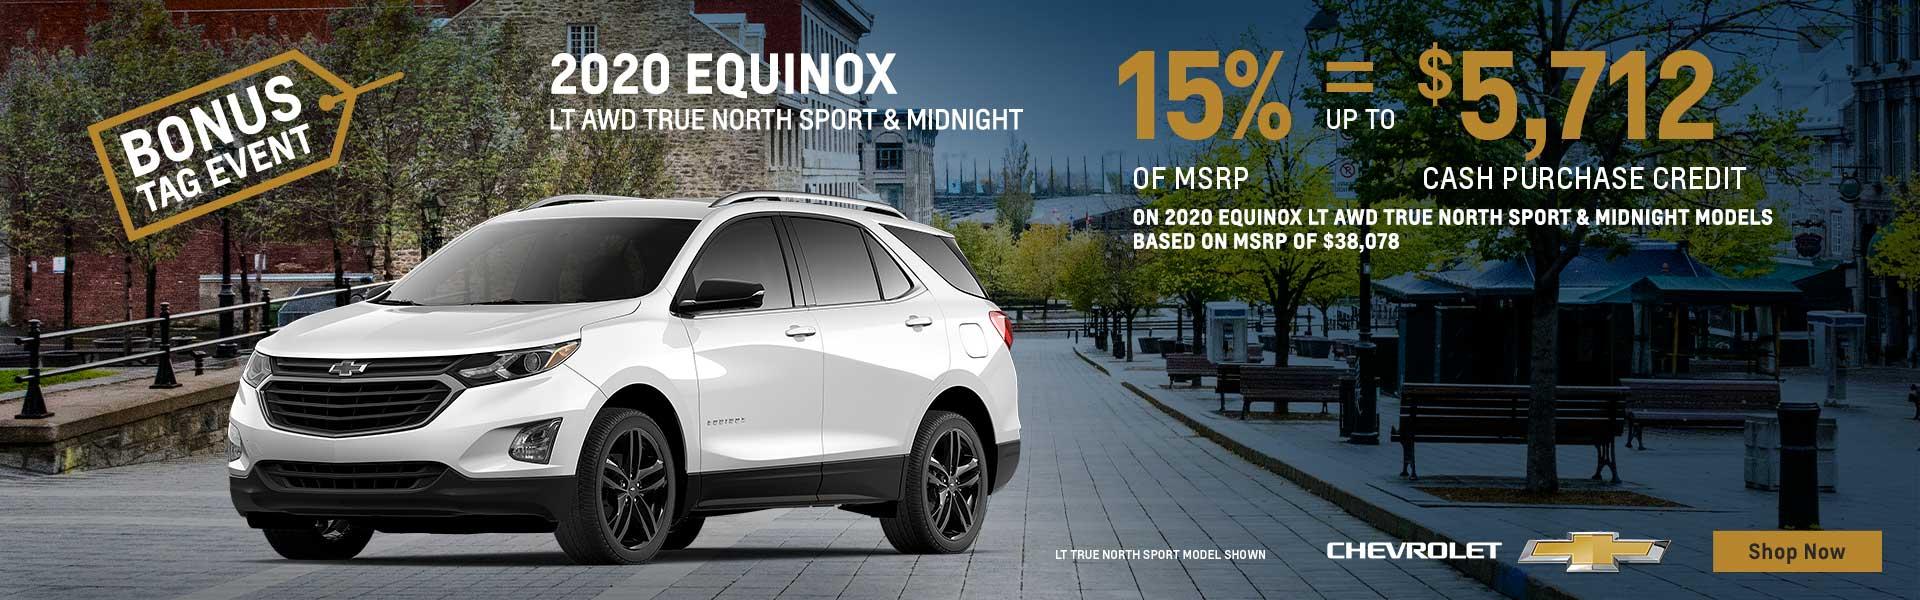 Bonus Tag Event on Chevrolet Equinox